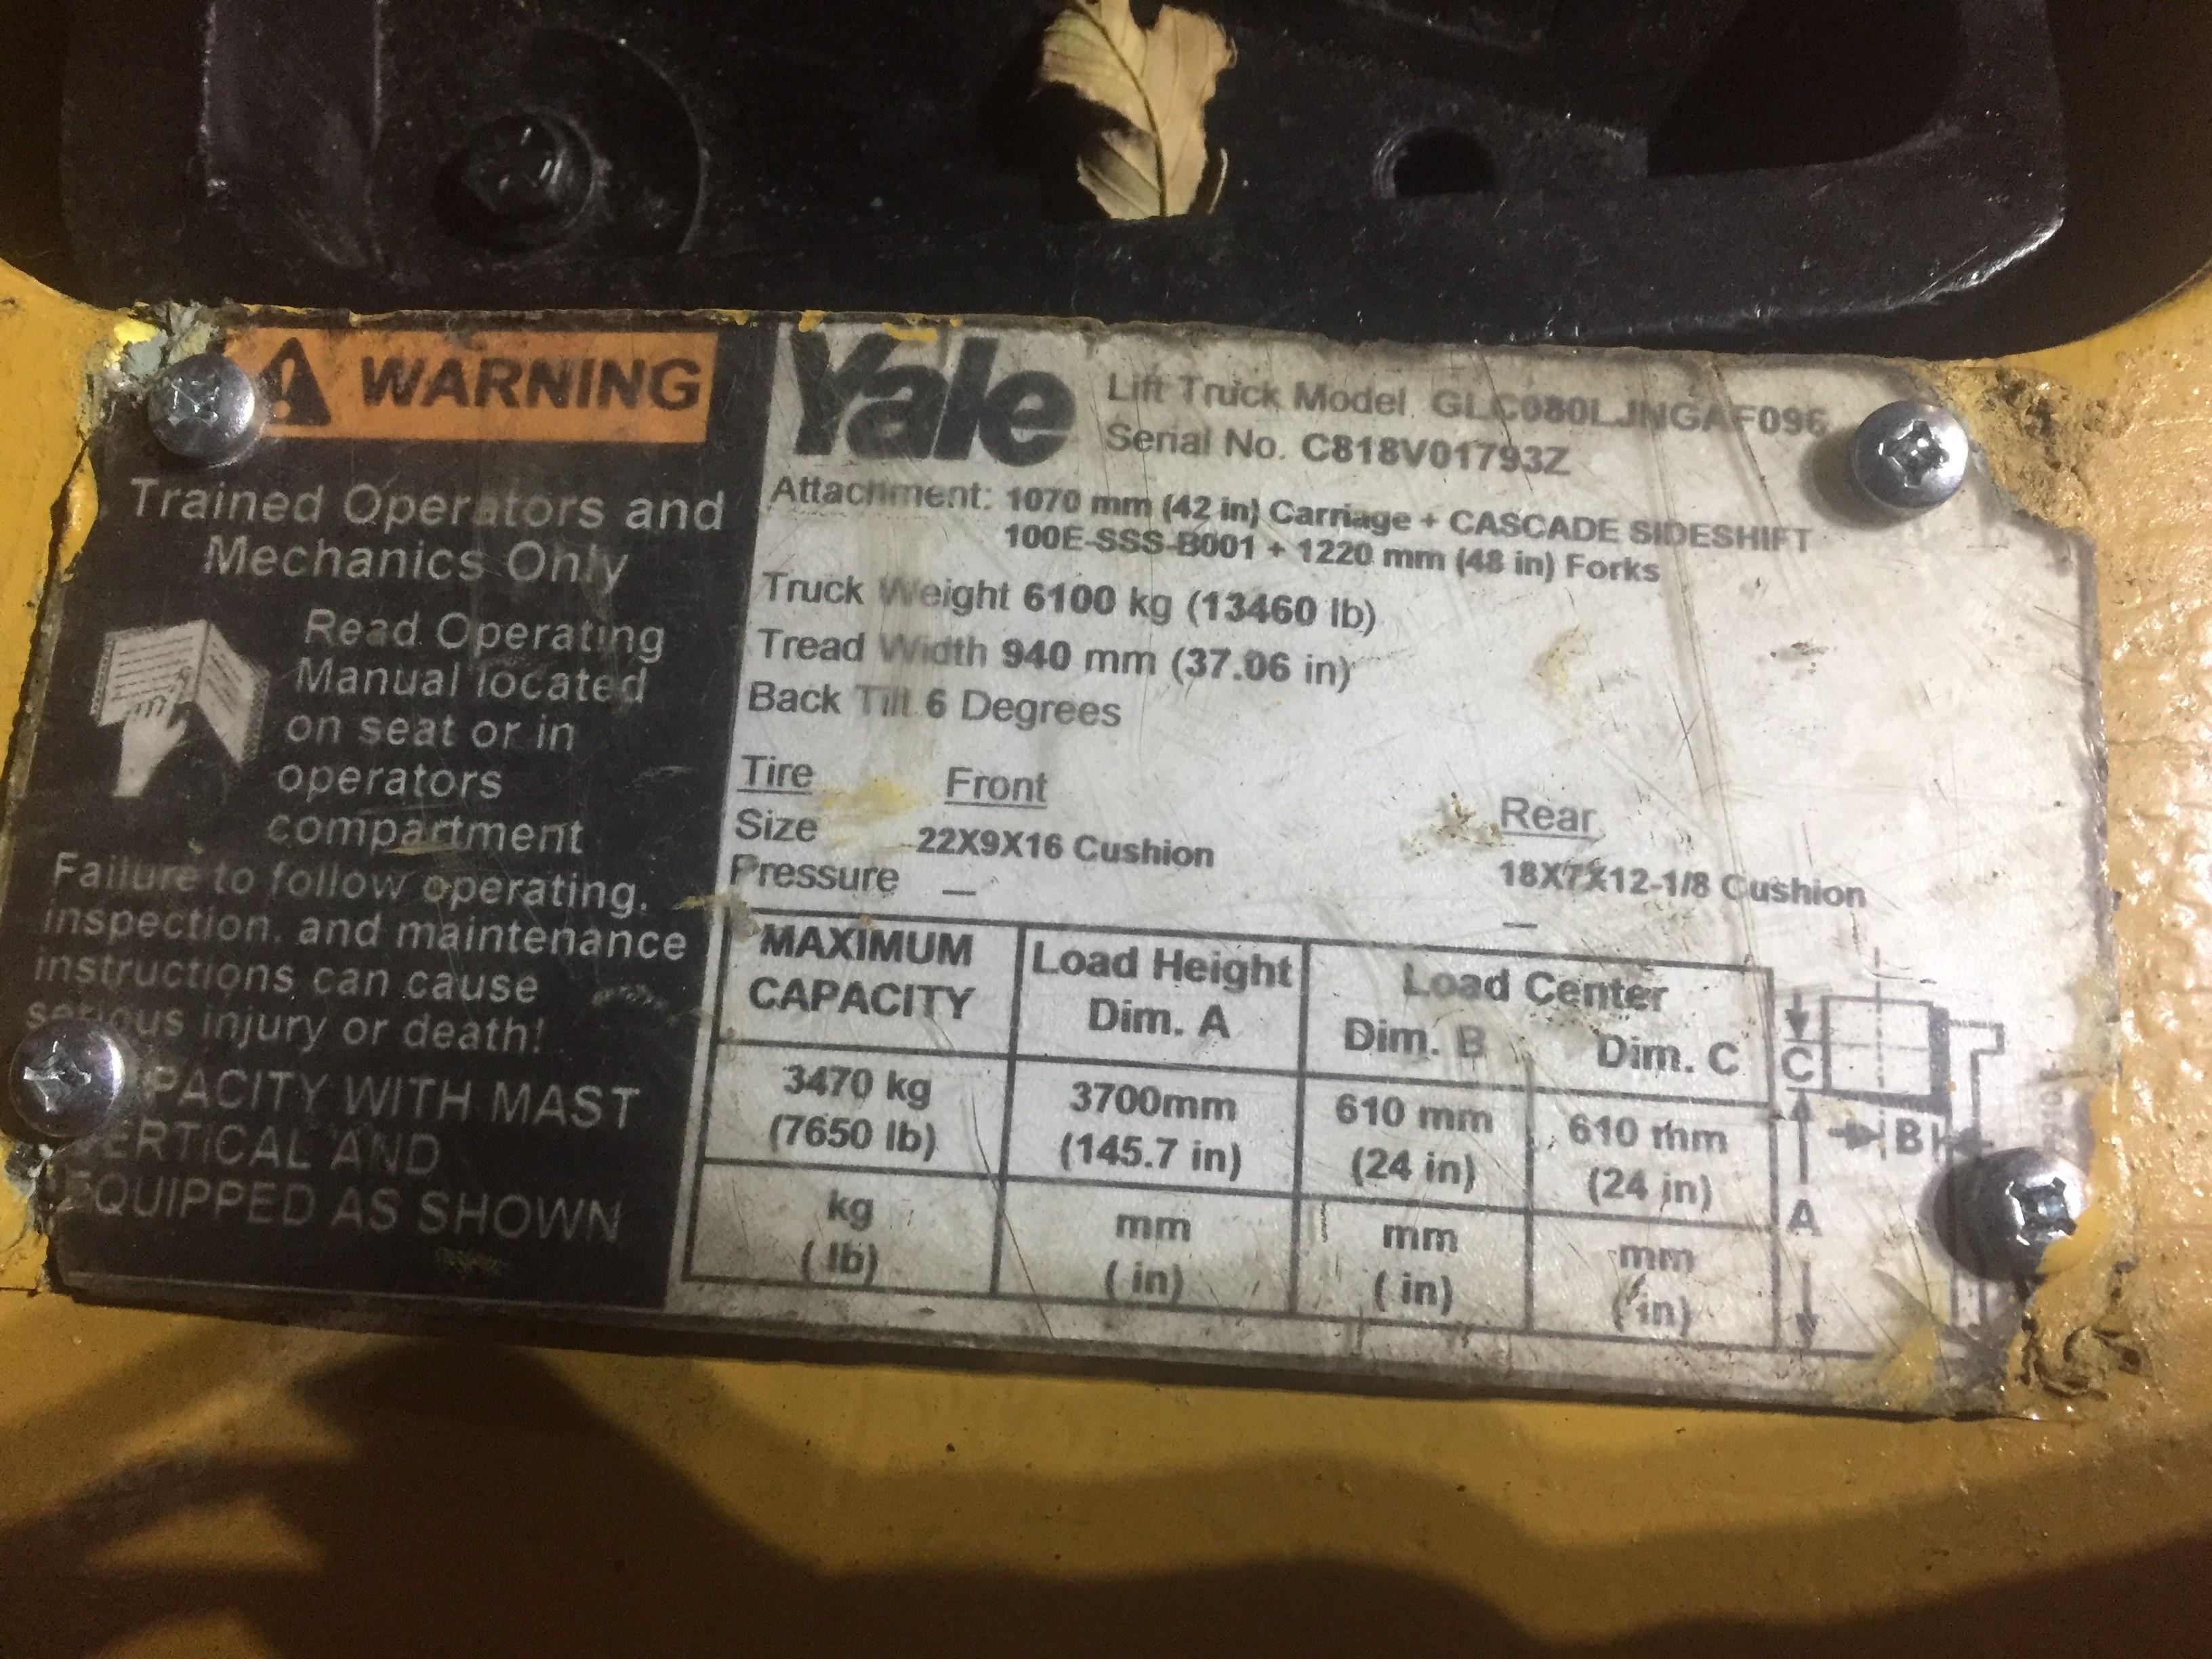 YALE (MODEL #GLC080LJNGAF096) 8,000LBS LP BOX CAR SPECIAL 3 STAGE FORKLIFT - SERIAL #C818V017932 - Image 3 of 5